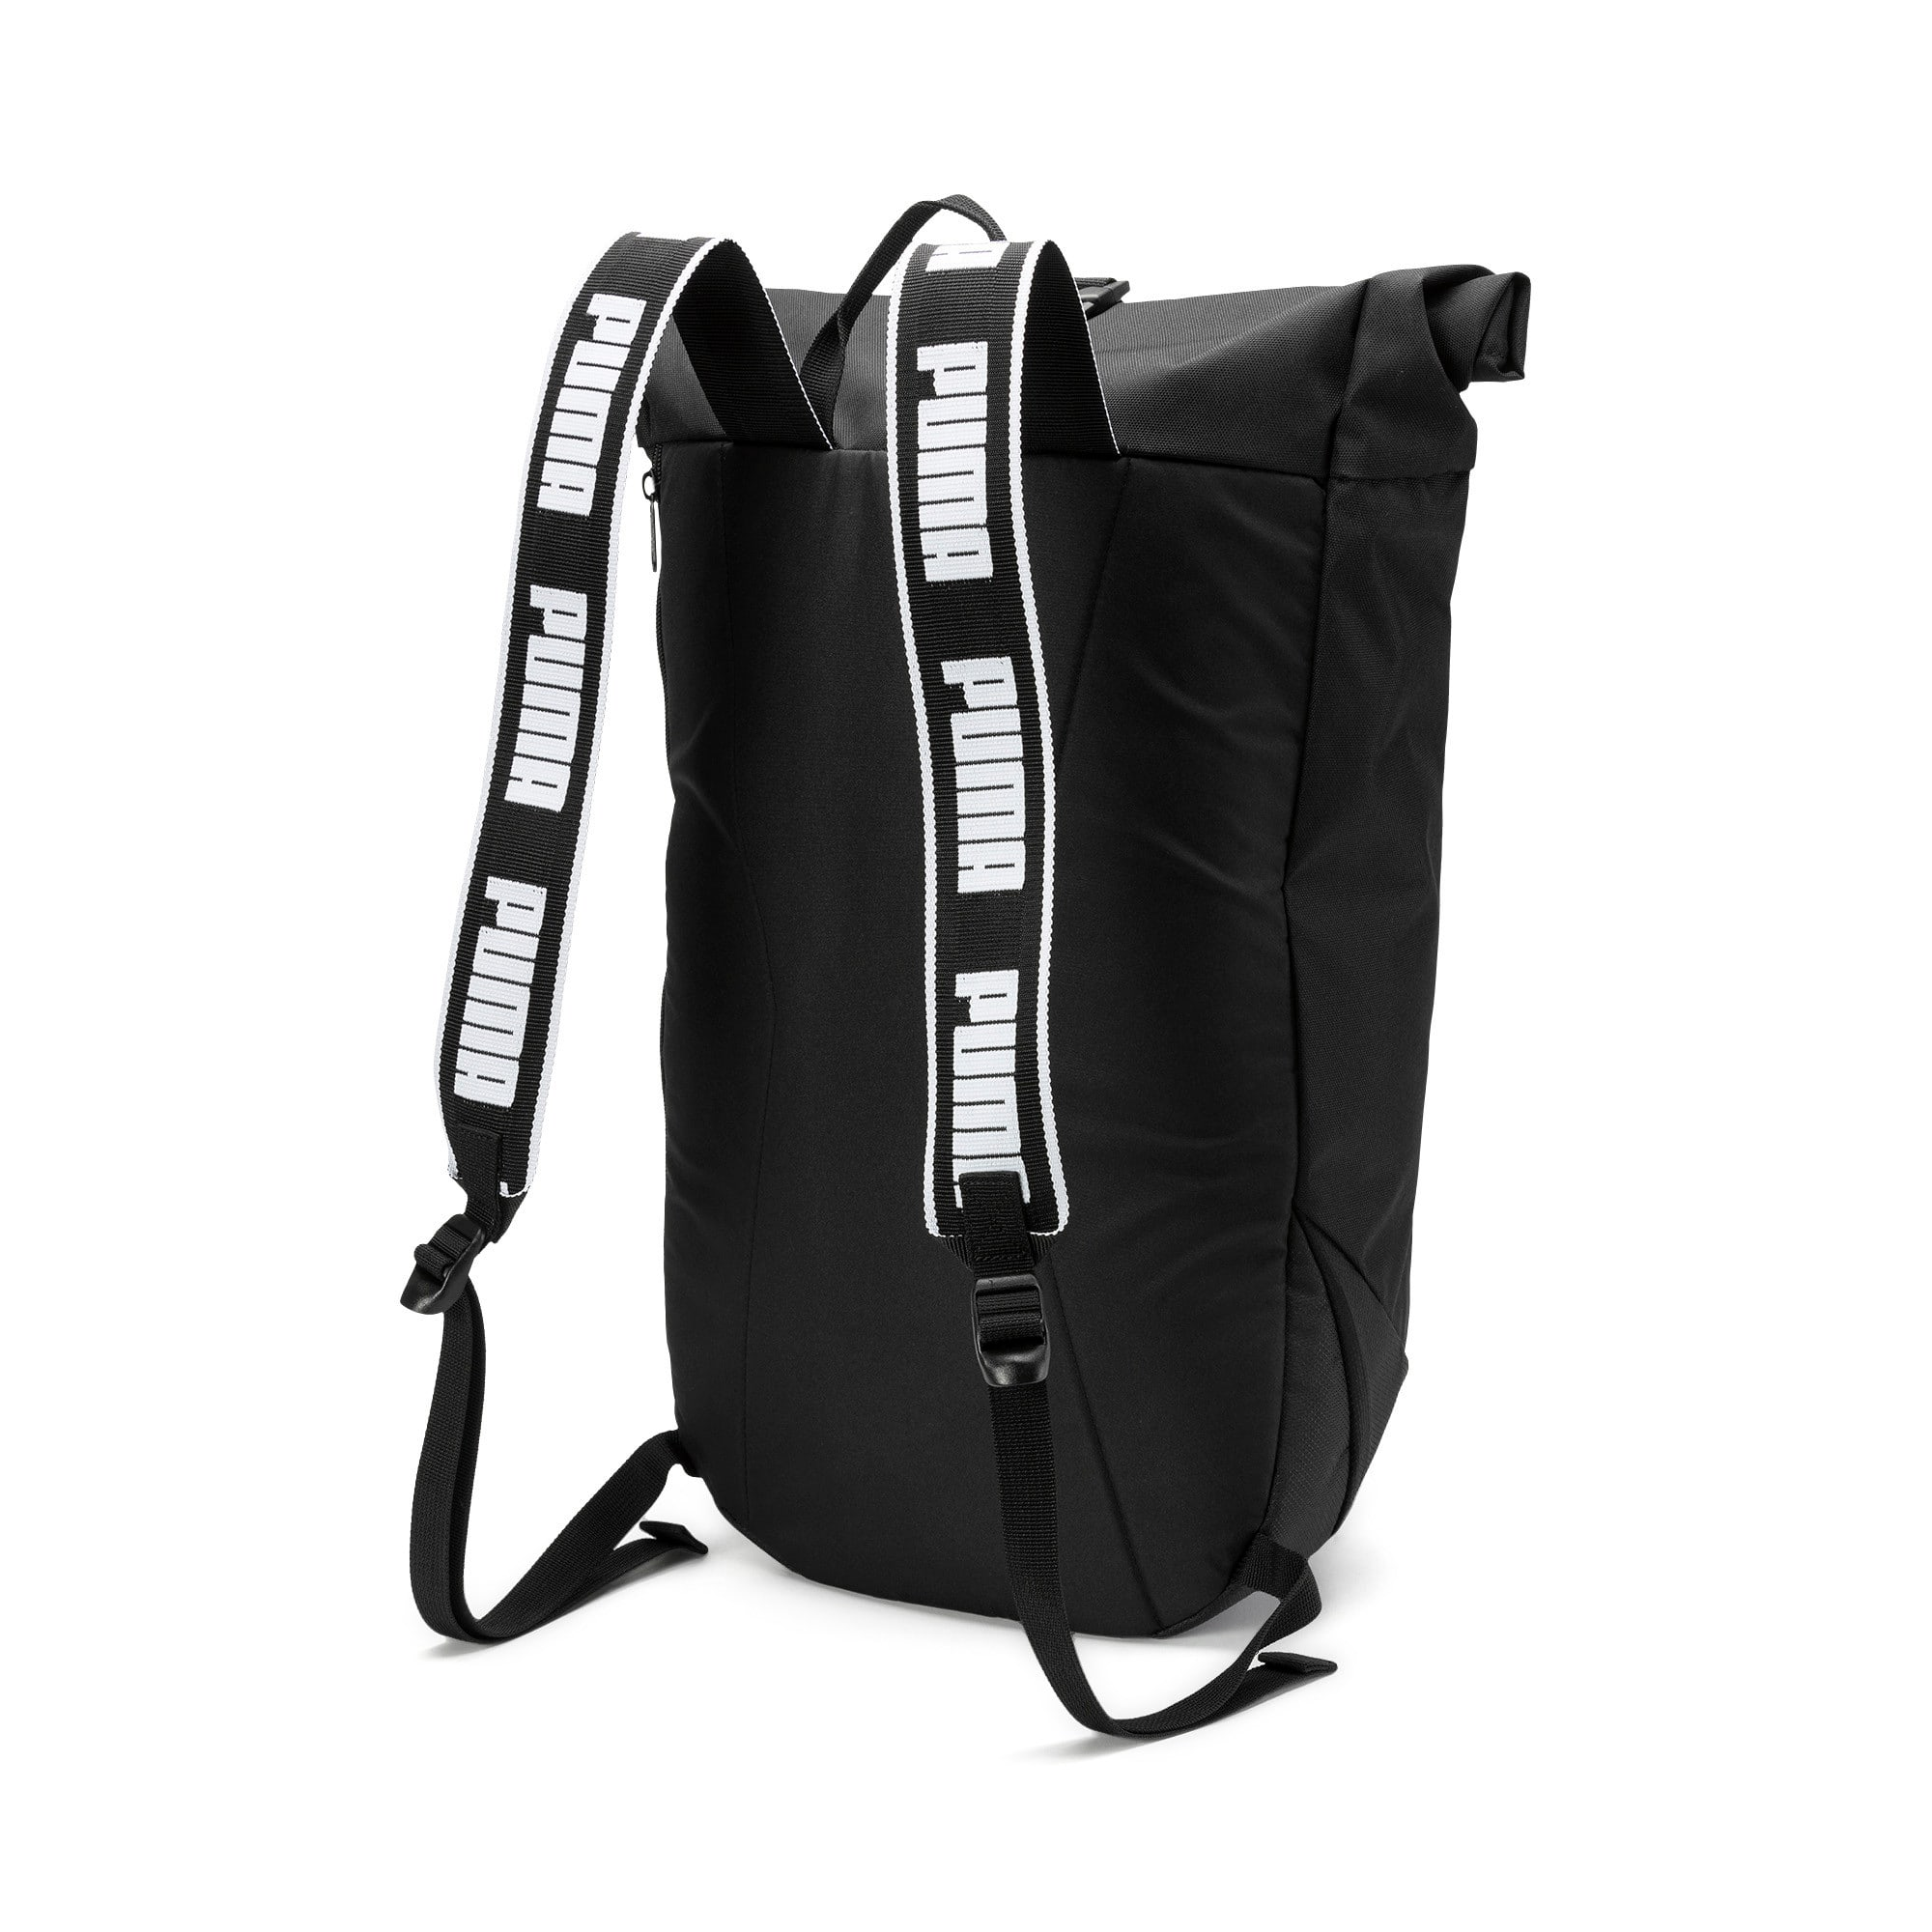 Thumbnail 2 of Sole Backpack, Puma Black, medium